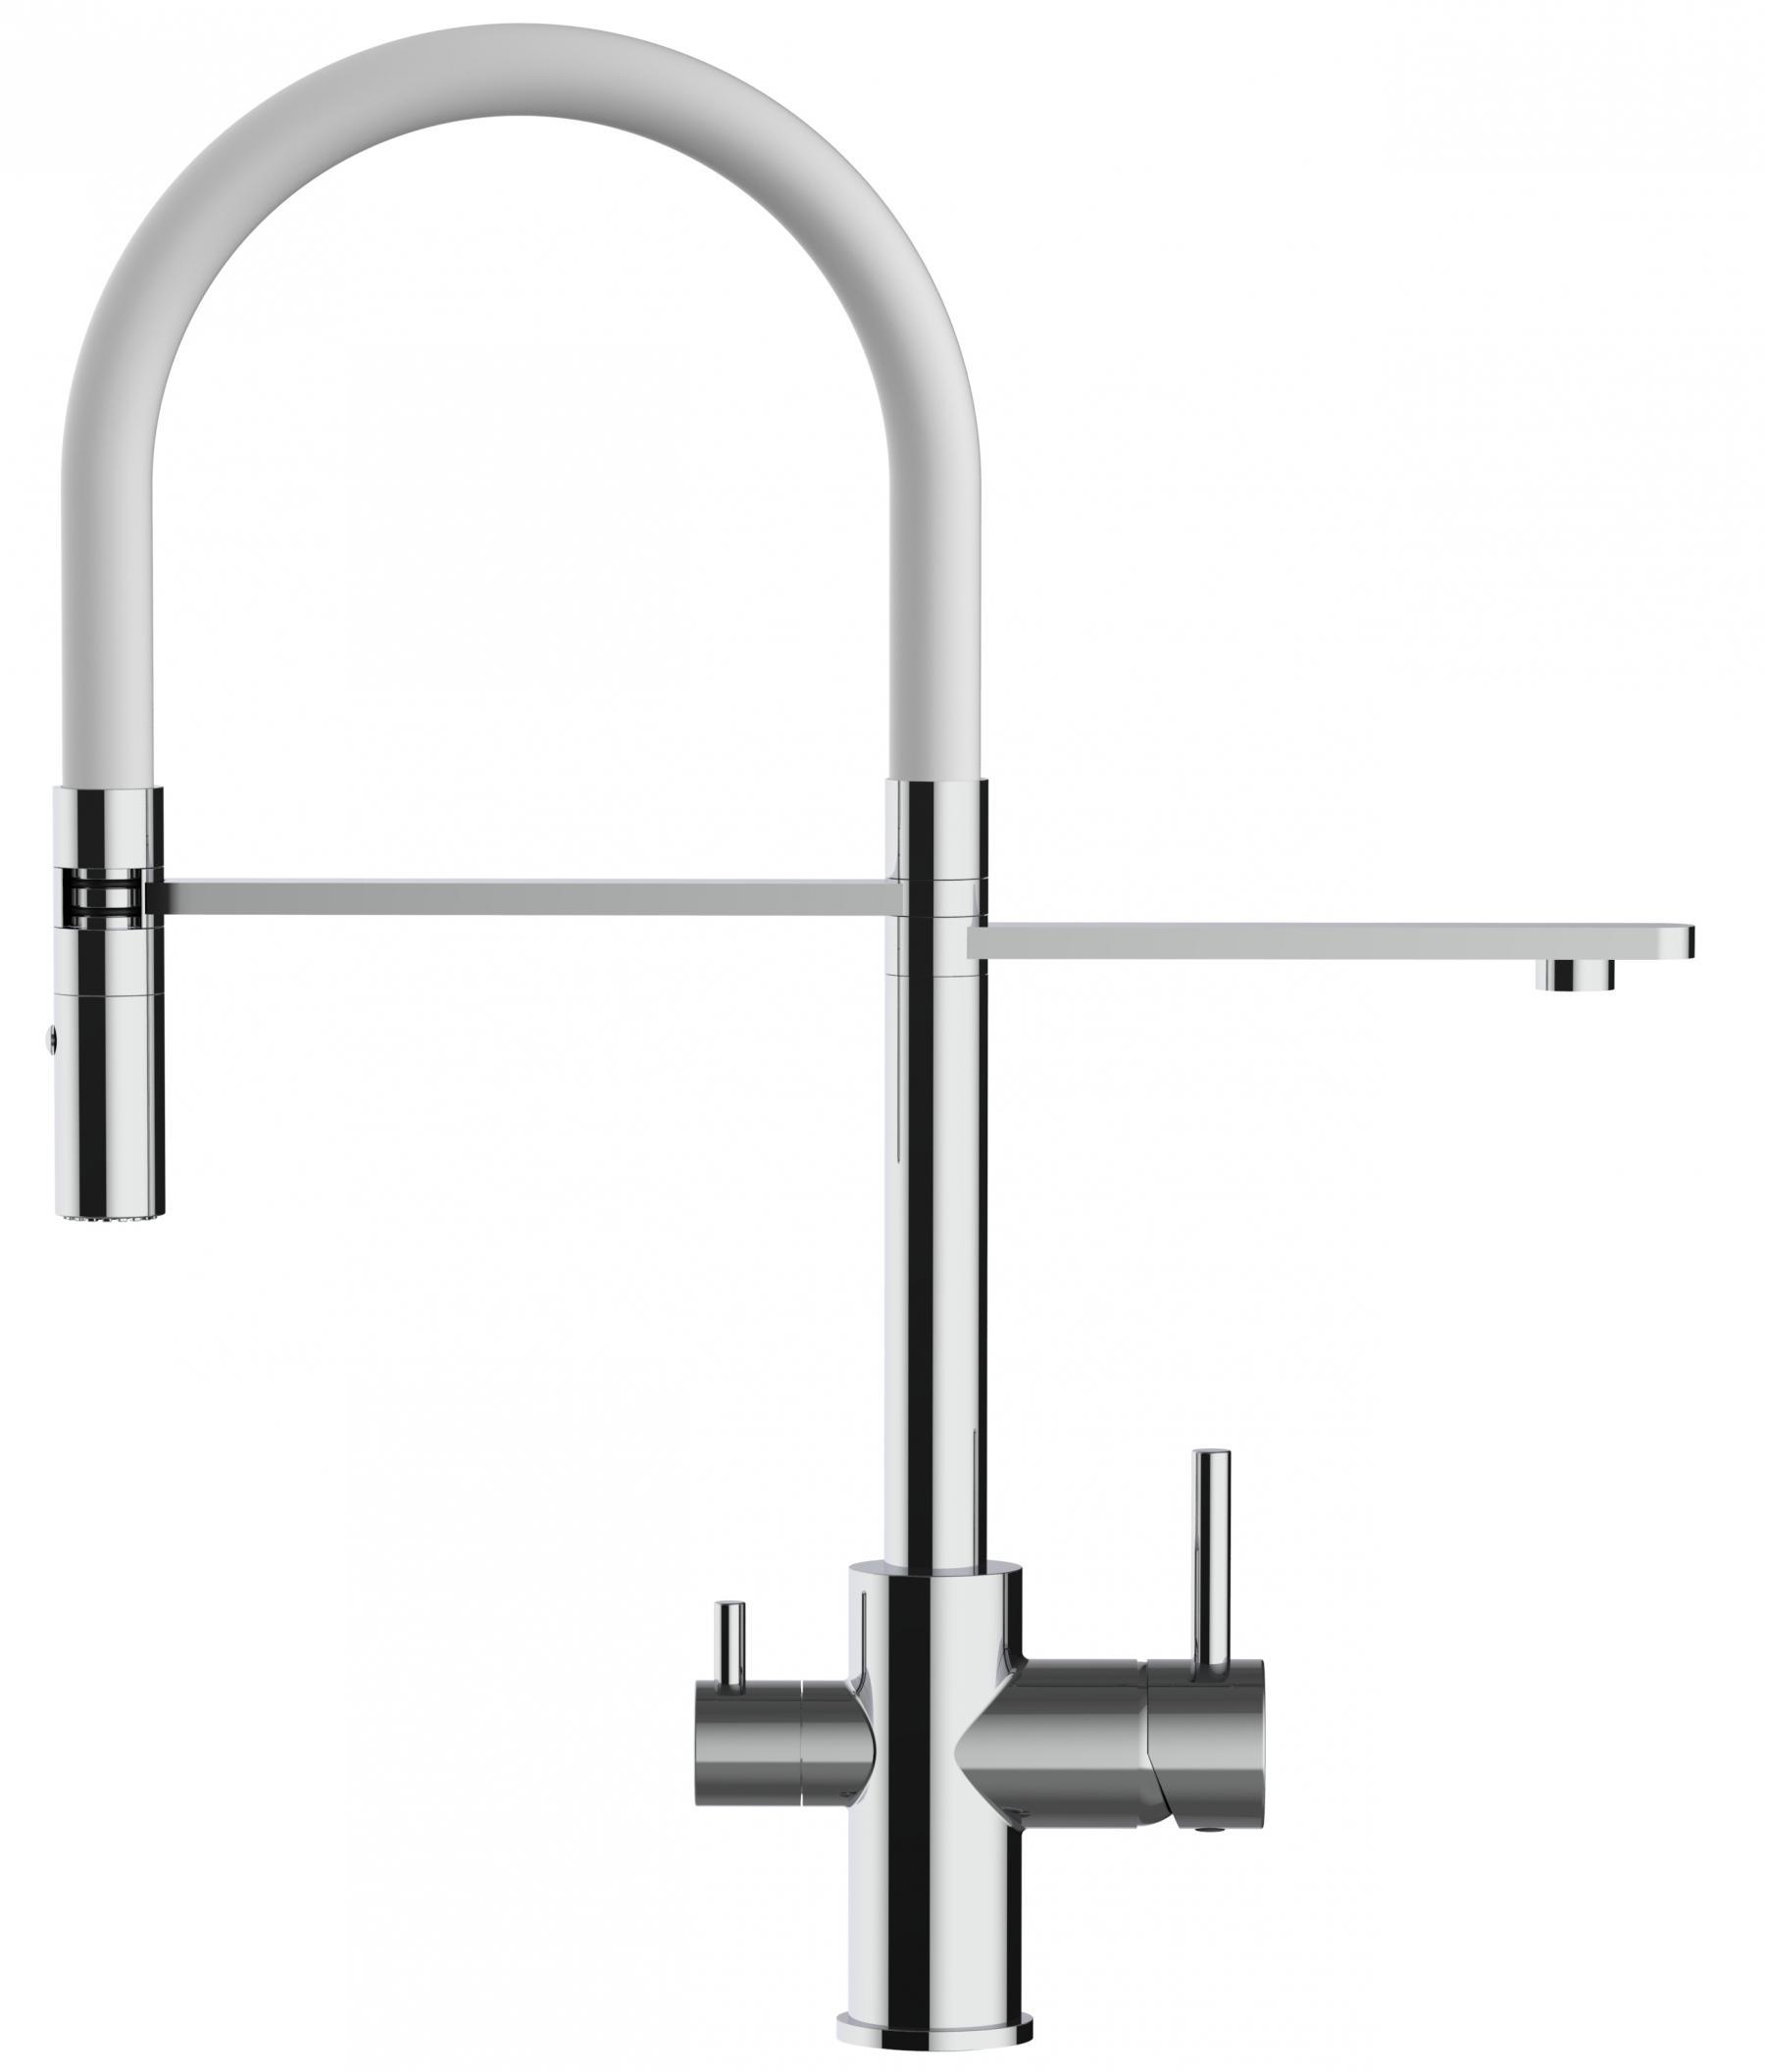 Berühmt Küchenarmatur Umkehr Osmose, Filter, Trinkwasser FH51